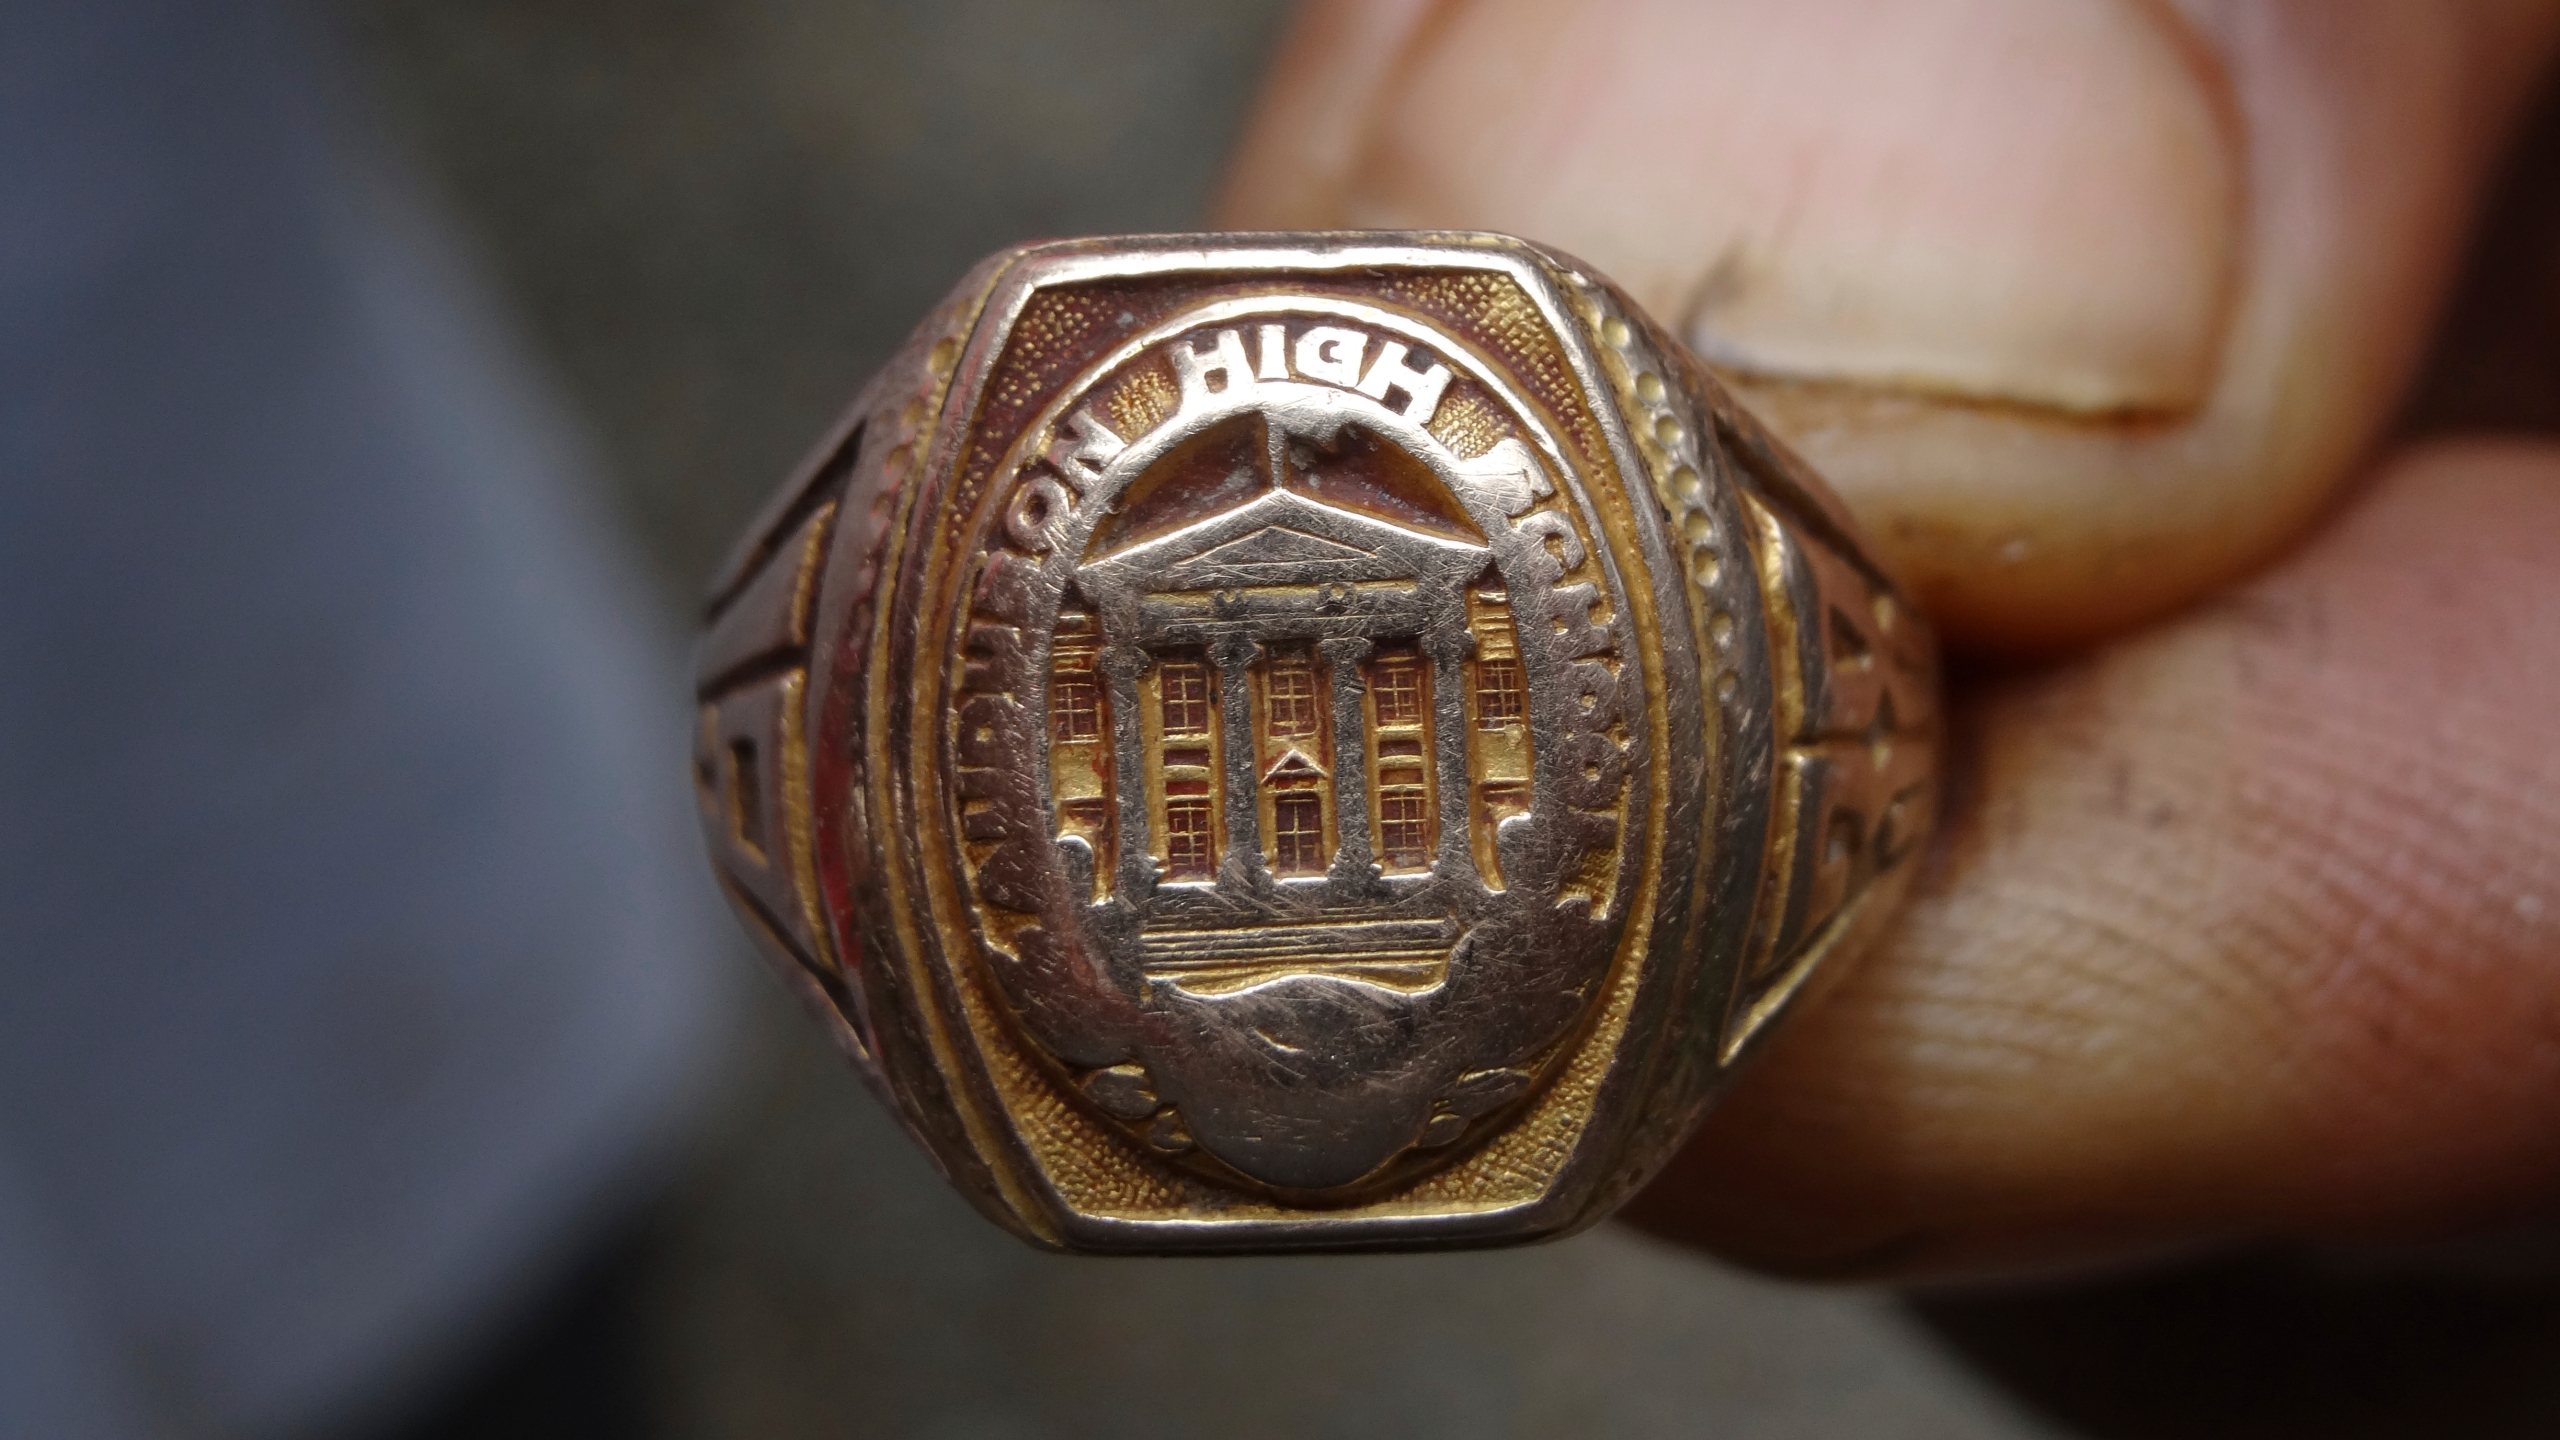 Vets Lost Ring Returned_236723